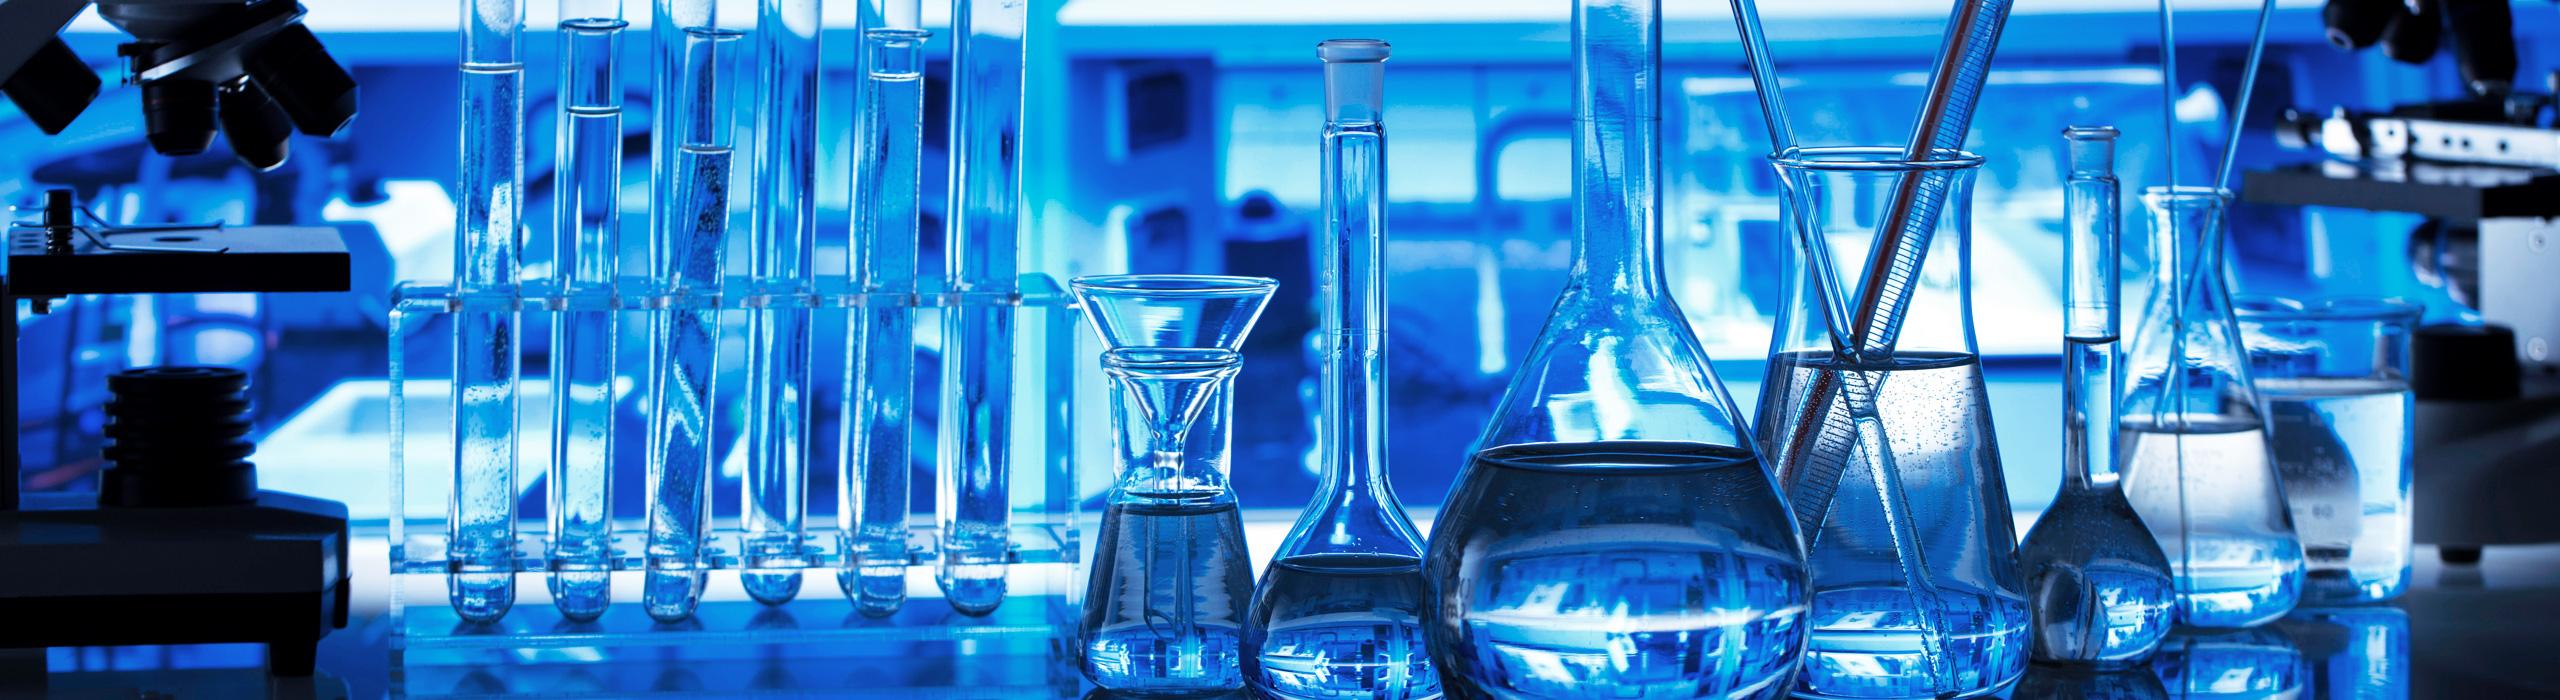 Bellmer Separation Technology Pharma Industry